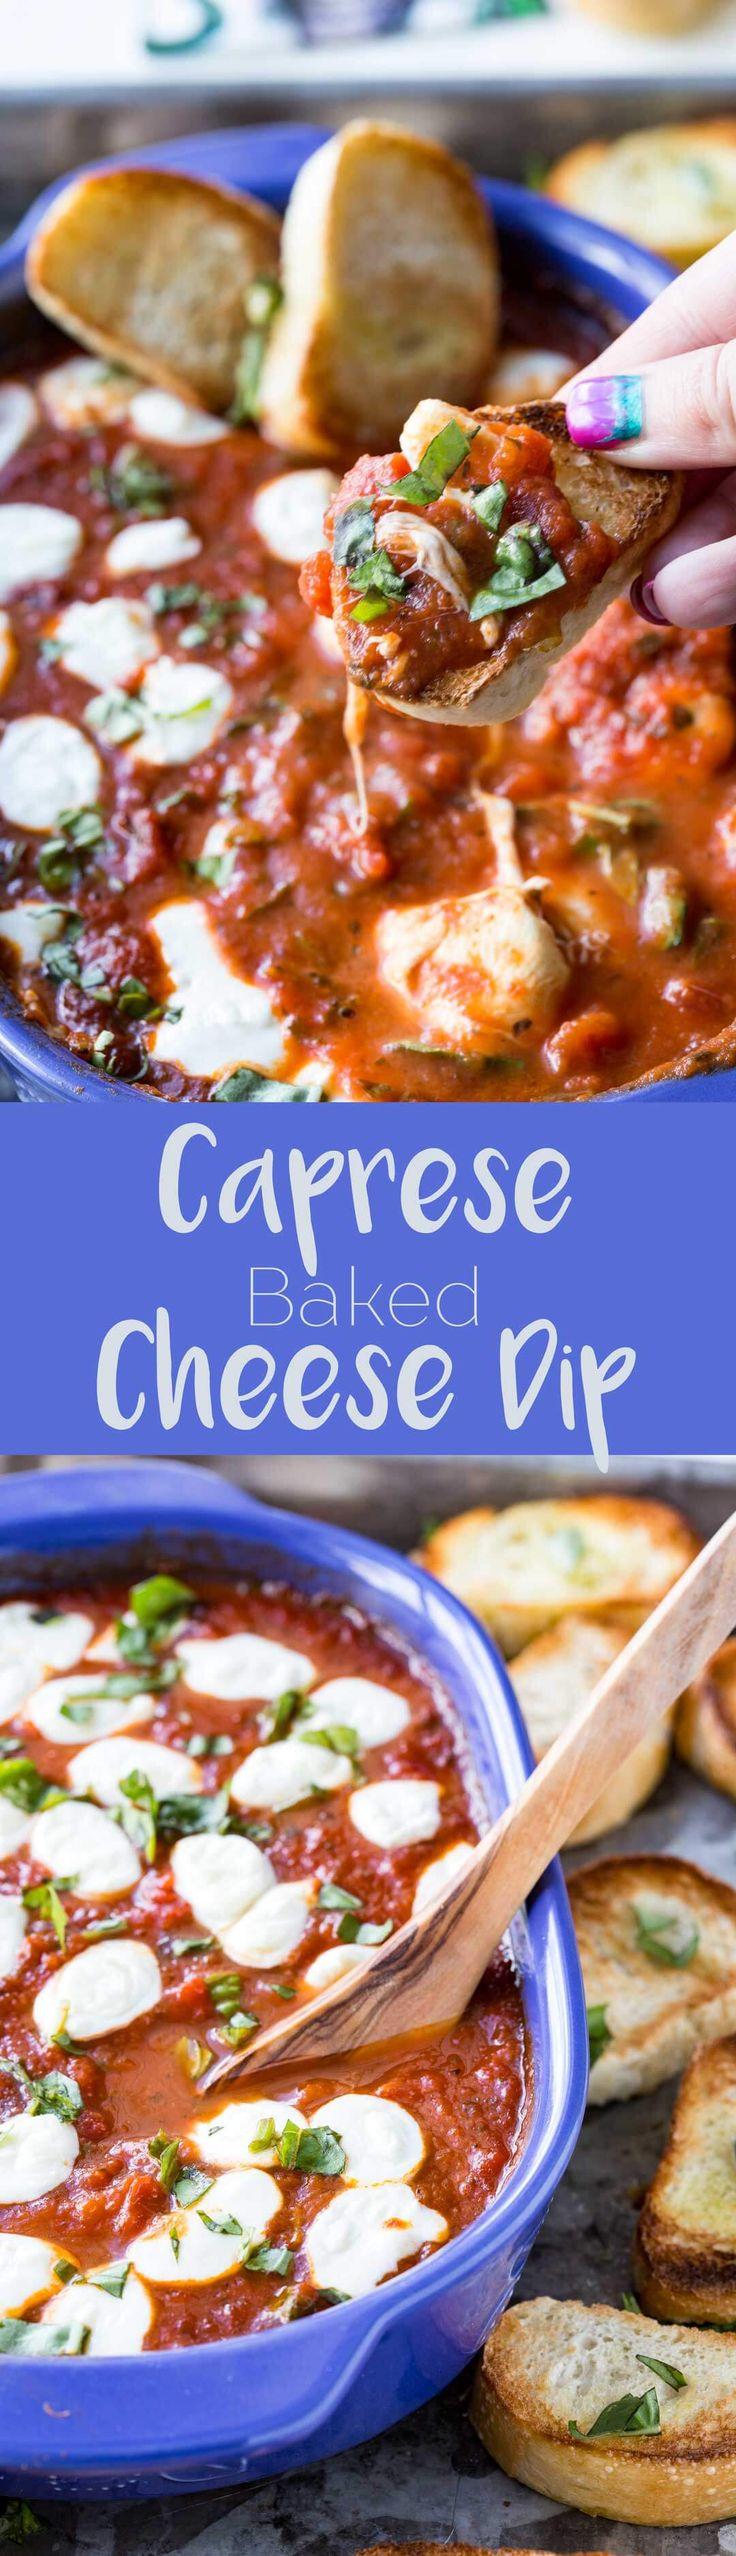 Caprese Baked Cheese Dip - Eazy Peazy Mealz